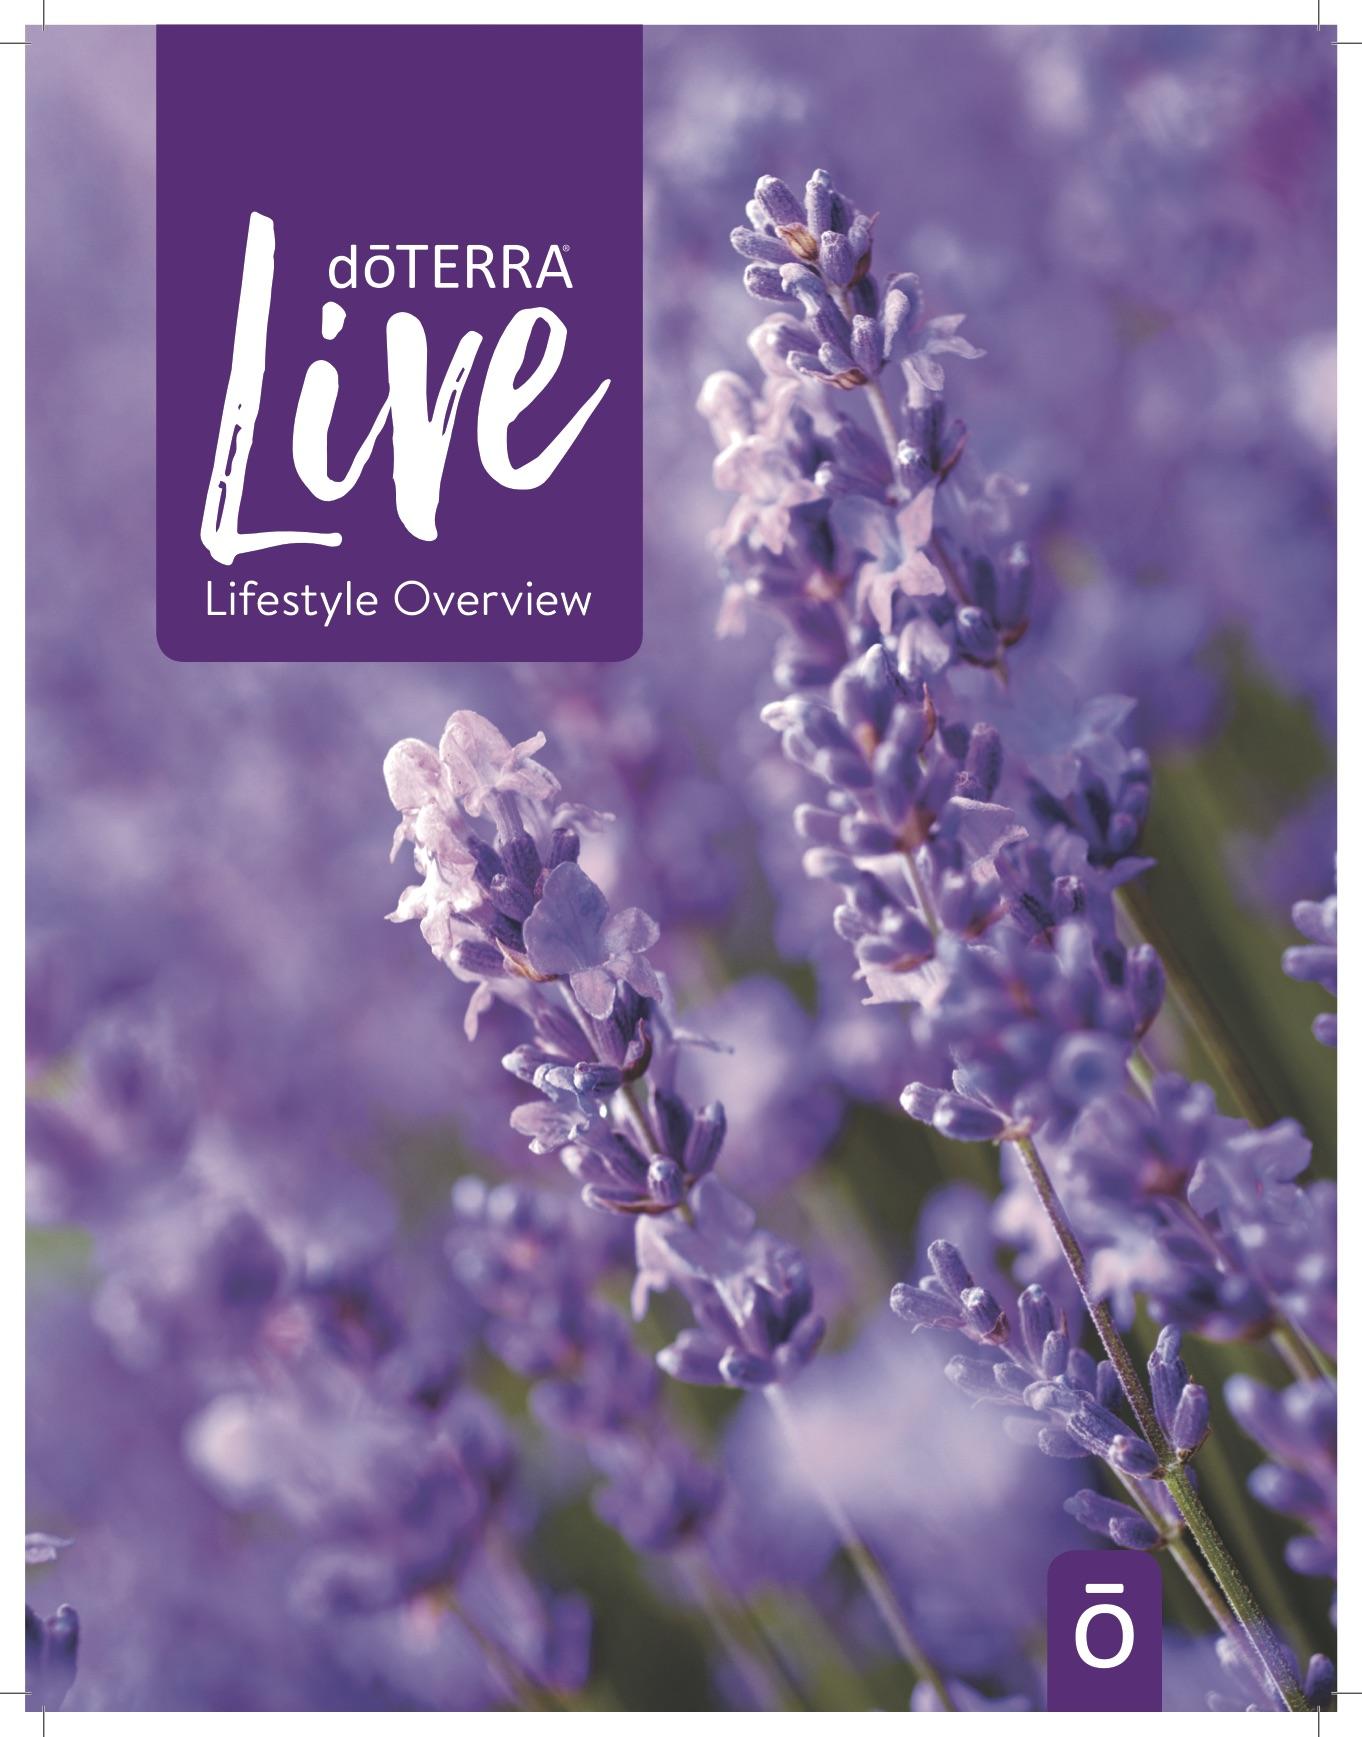 doTerra live lifestyle 1.jpg